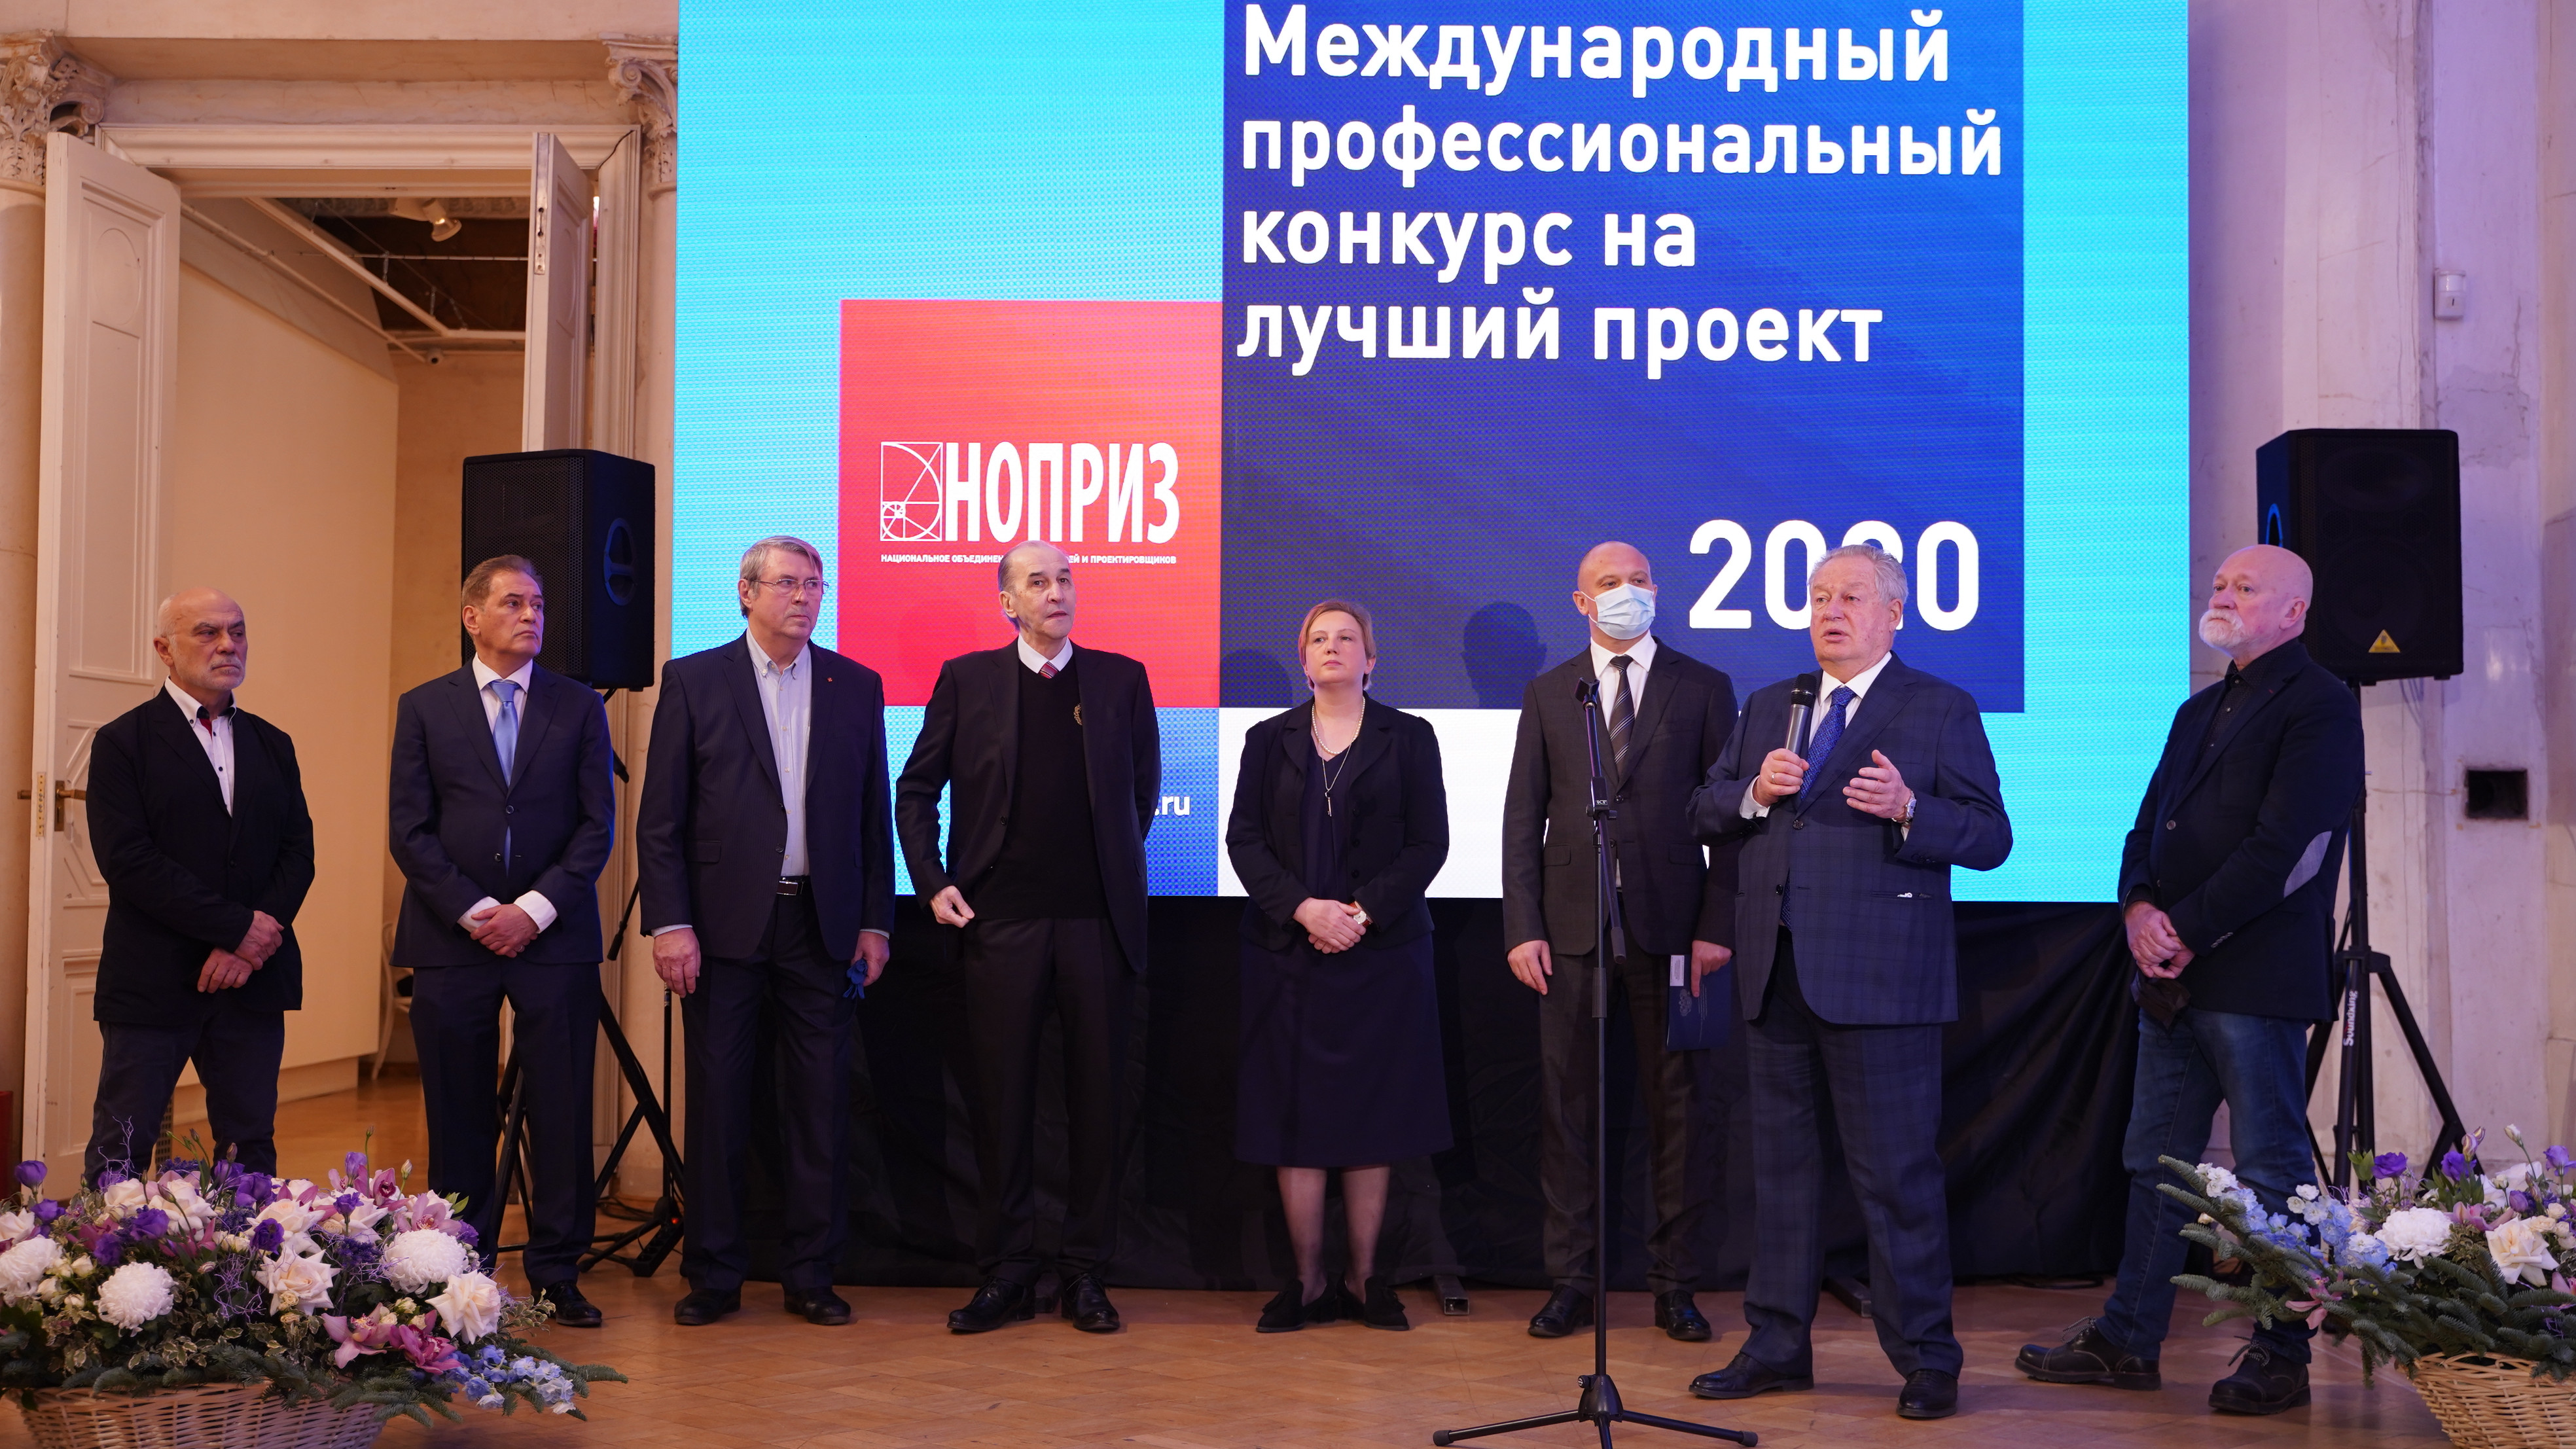 Проект ГБУ МО «Мособлгеотрест» победил в конкурсе НОПРИЗ